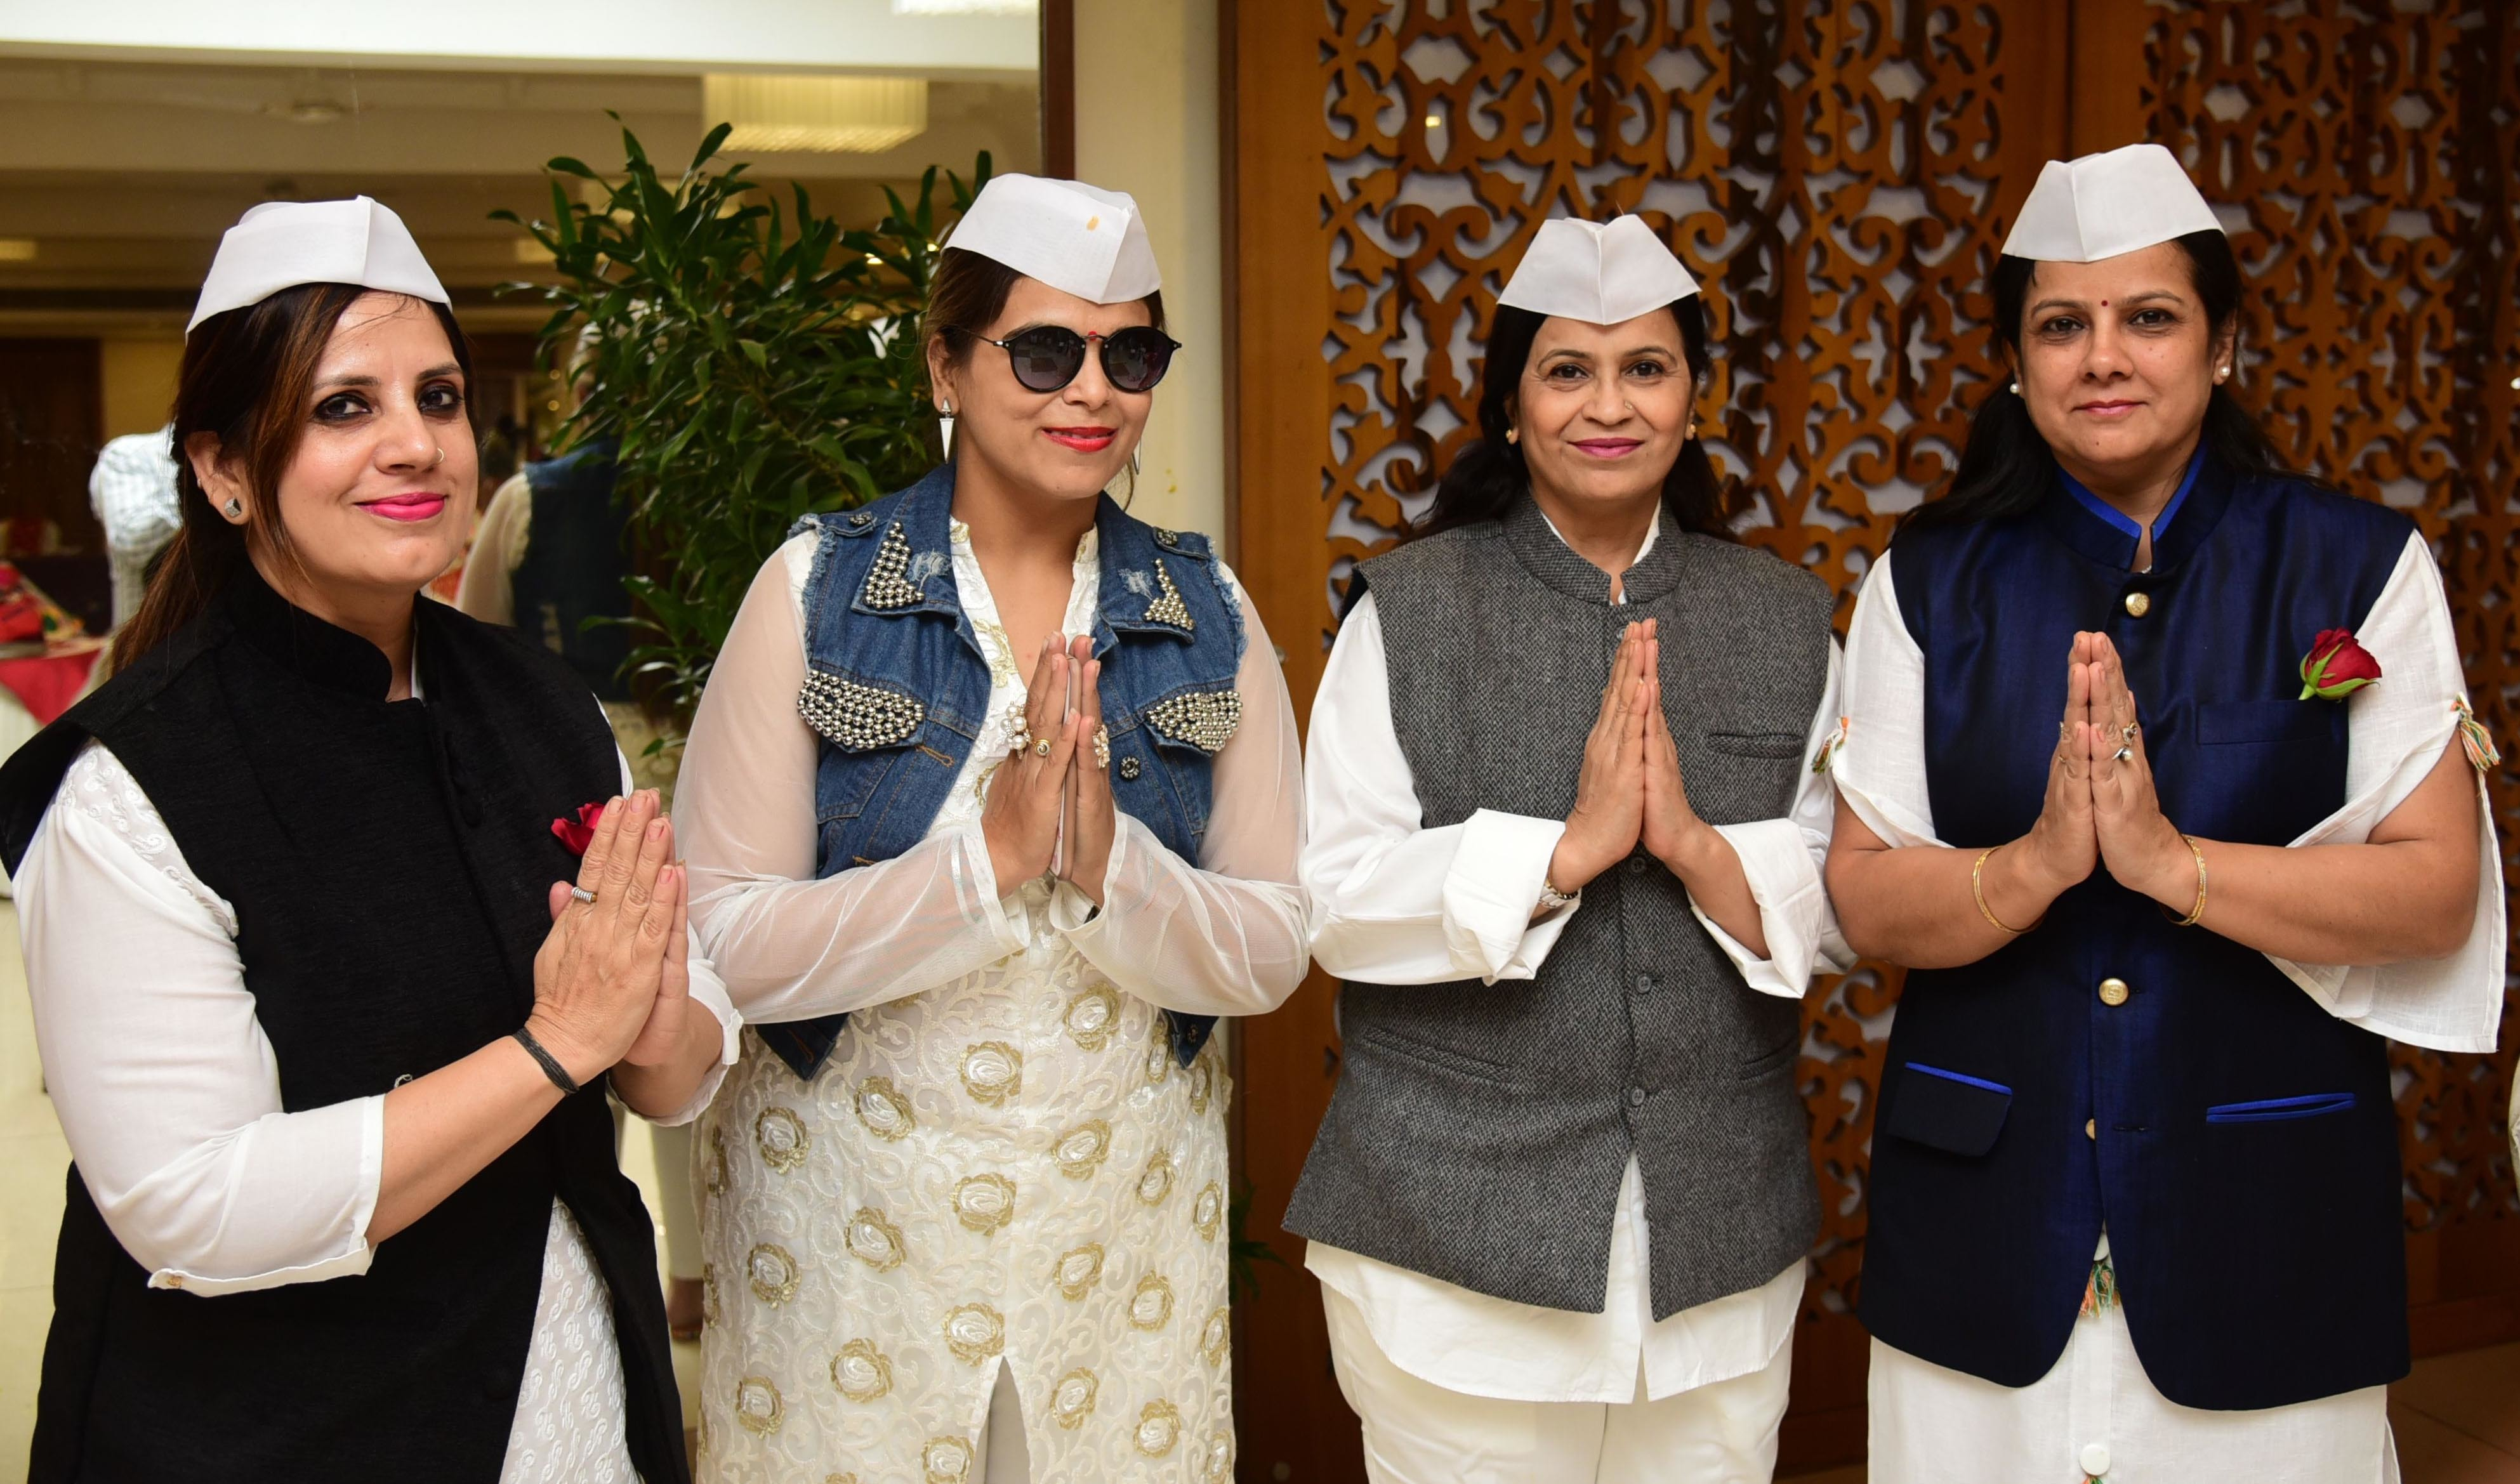 Members welcoming the ladies in full political swag.